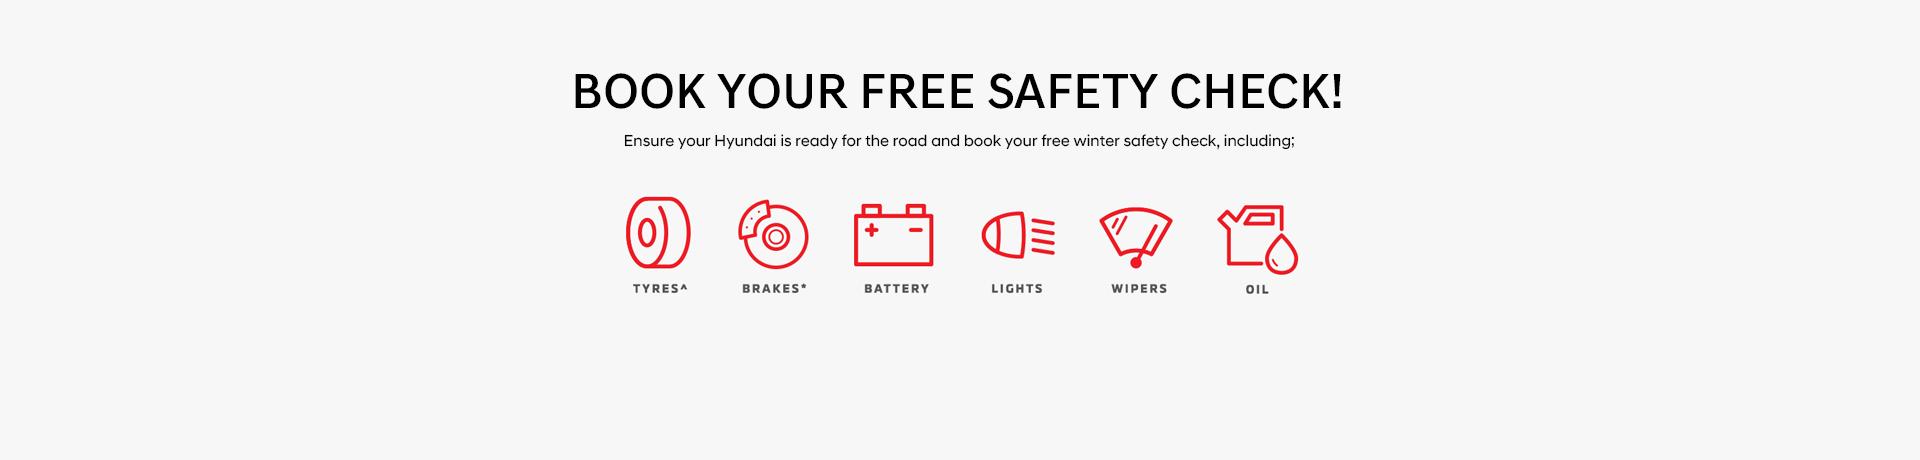 Image of safety check banner at Zupps Aspley Hyundai